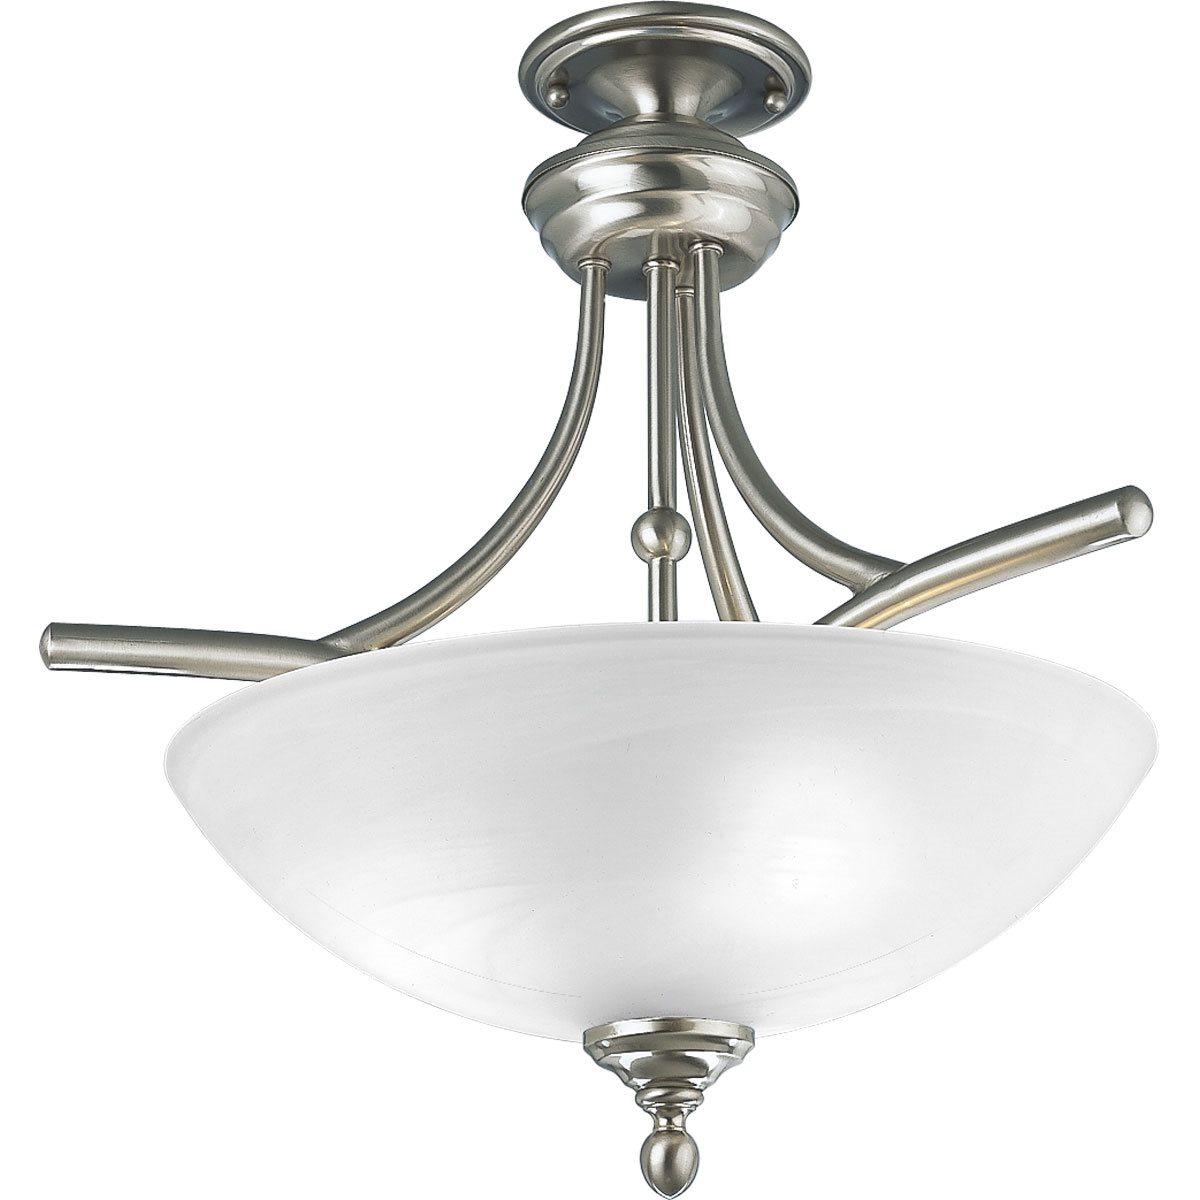 Progress lighting p3780 09 glendale transitional semi Semi flush mount ceiling lights